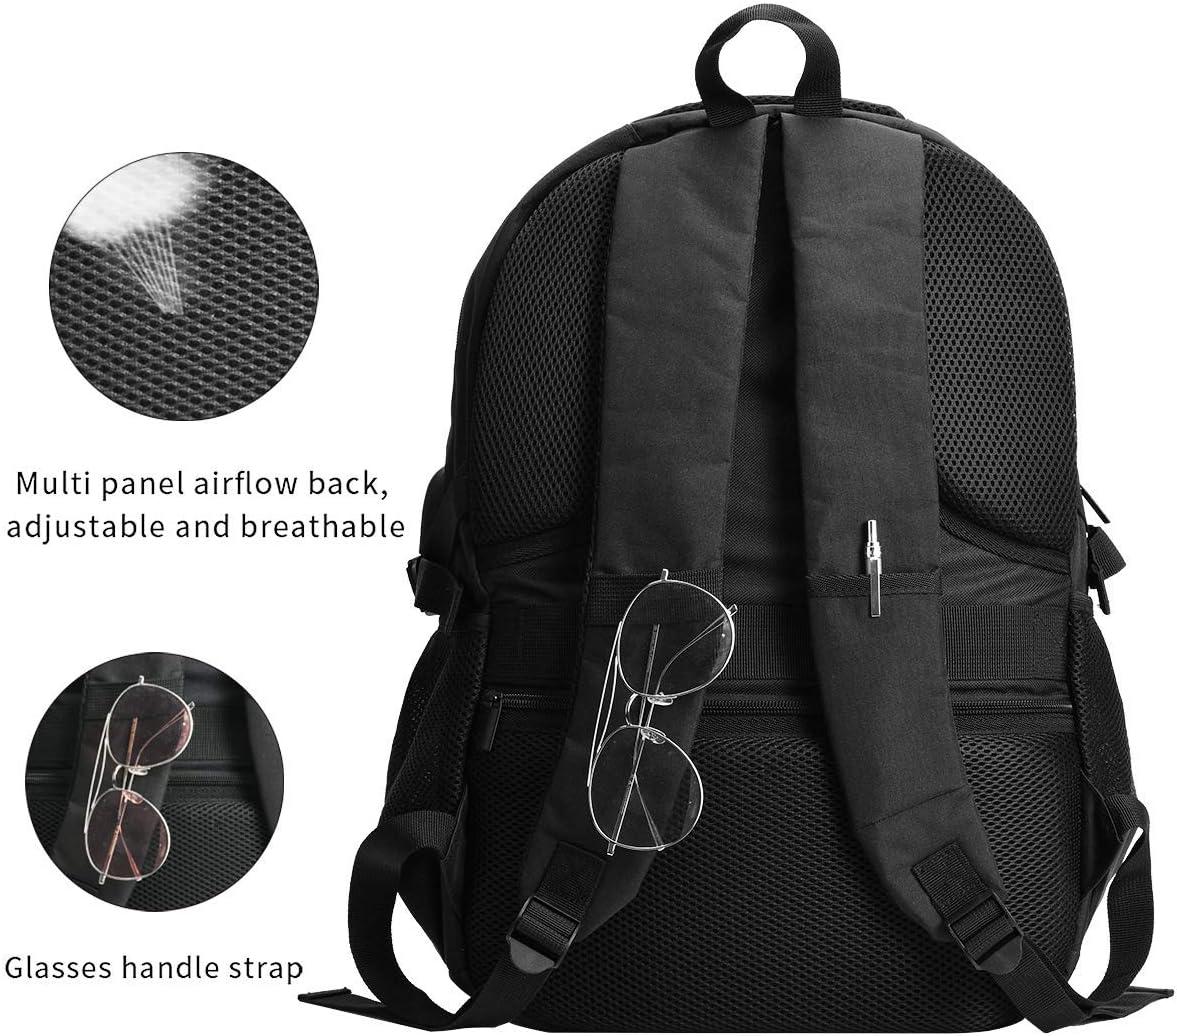 Games Hyperdimension Neptunia Backpack Travel Laptop Backpack with USB Charging Port Headphone Interface College Bookbag for Women Men Boys Business Travel Anti Theft Backpack